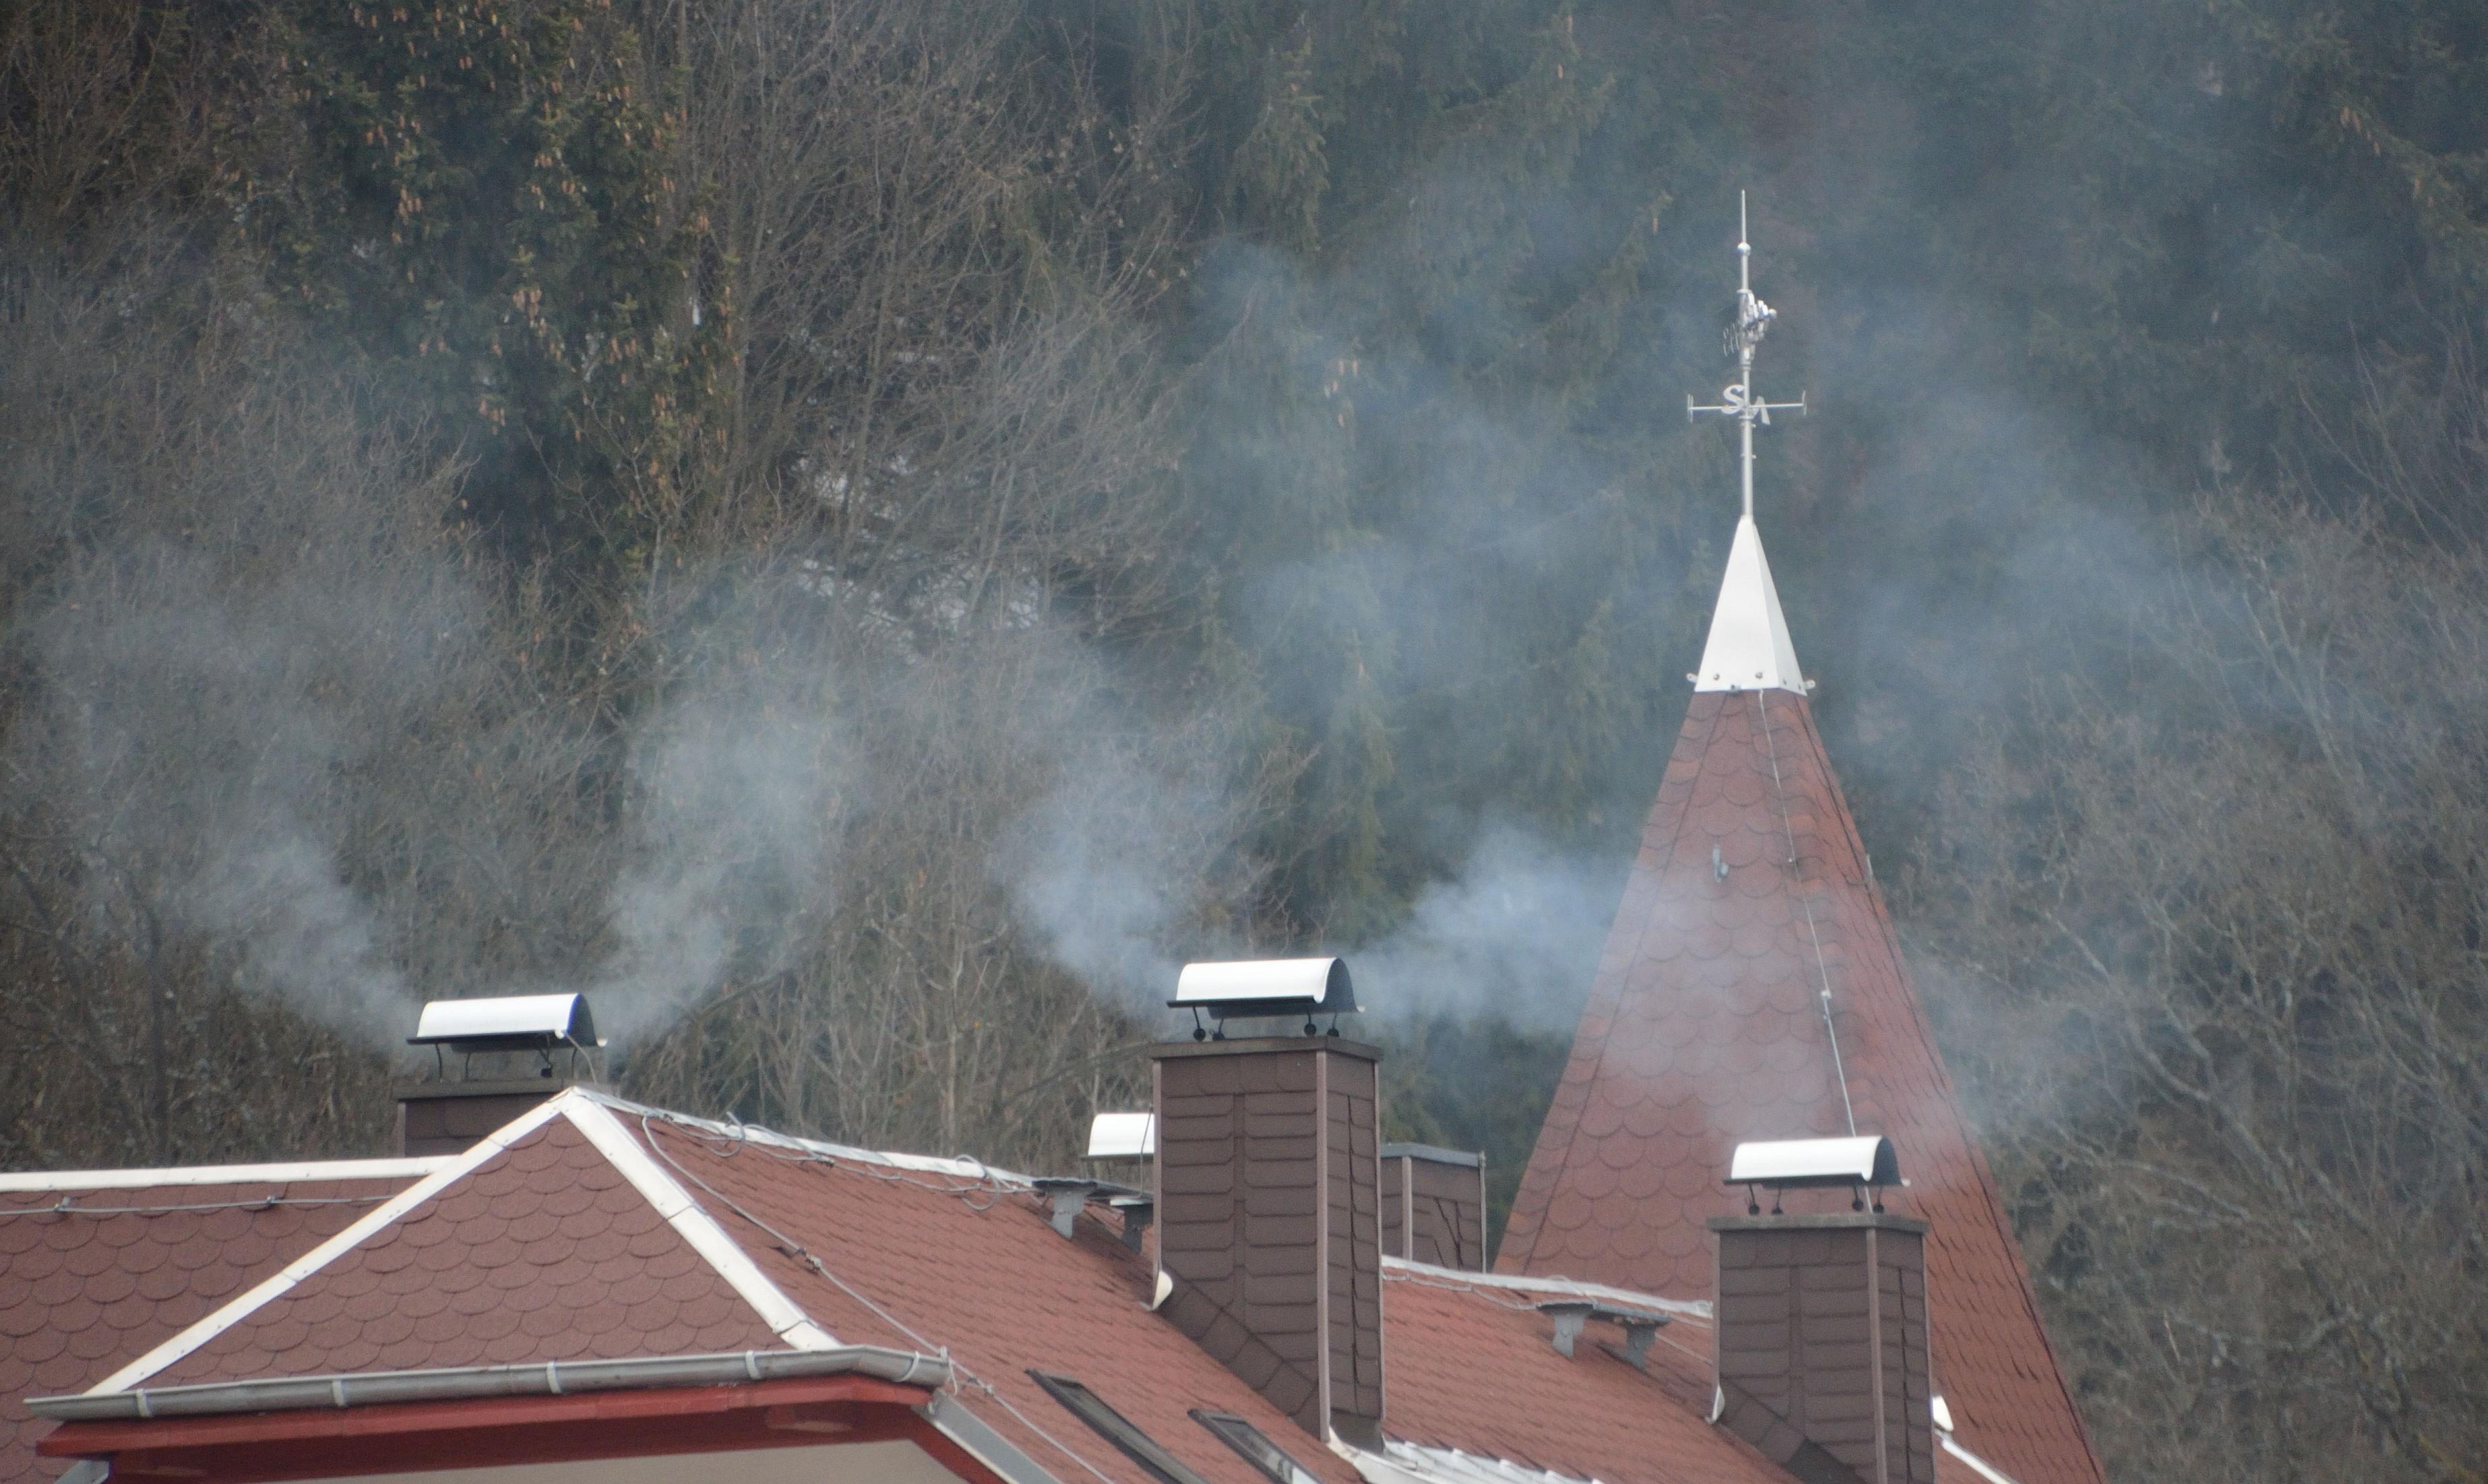 Luftverschmutzung. Foto: Tilo Arnhold/TROPOS